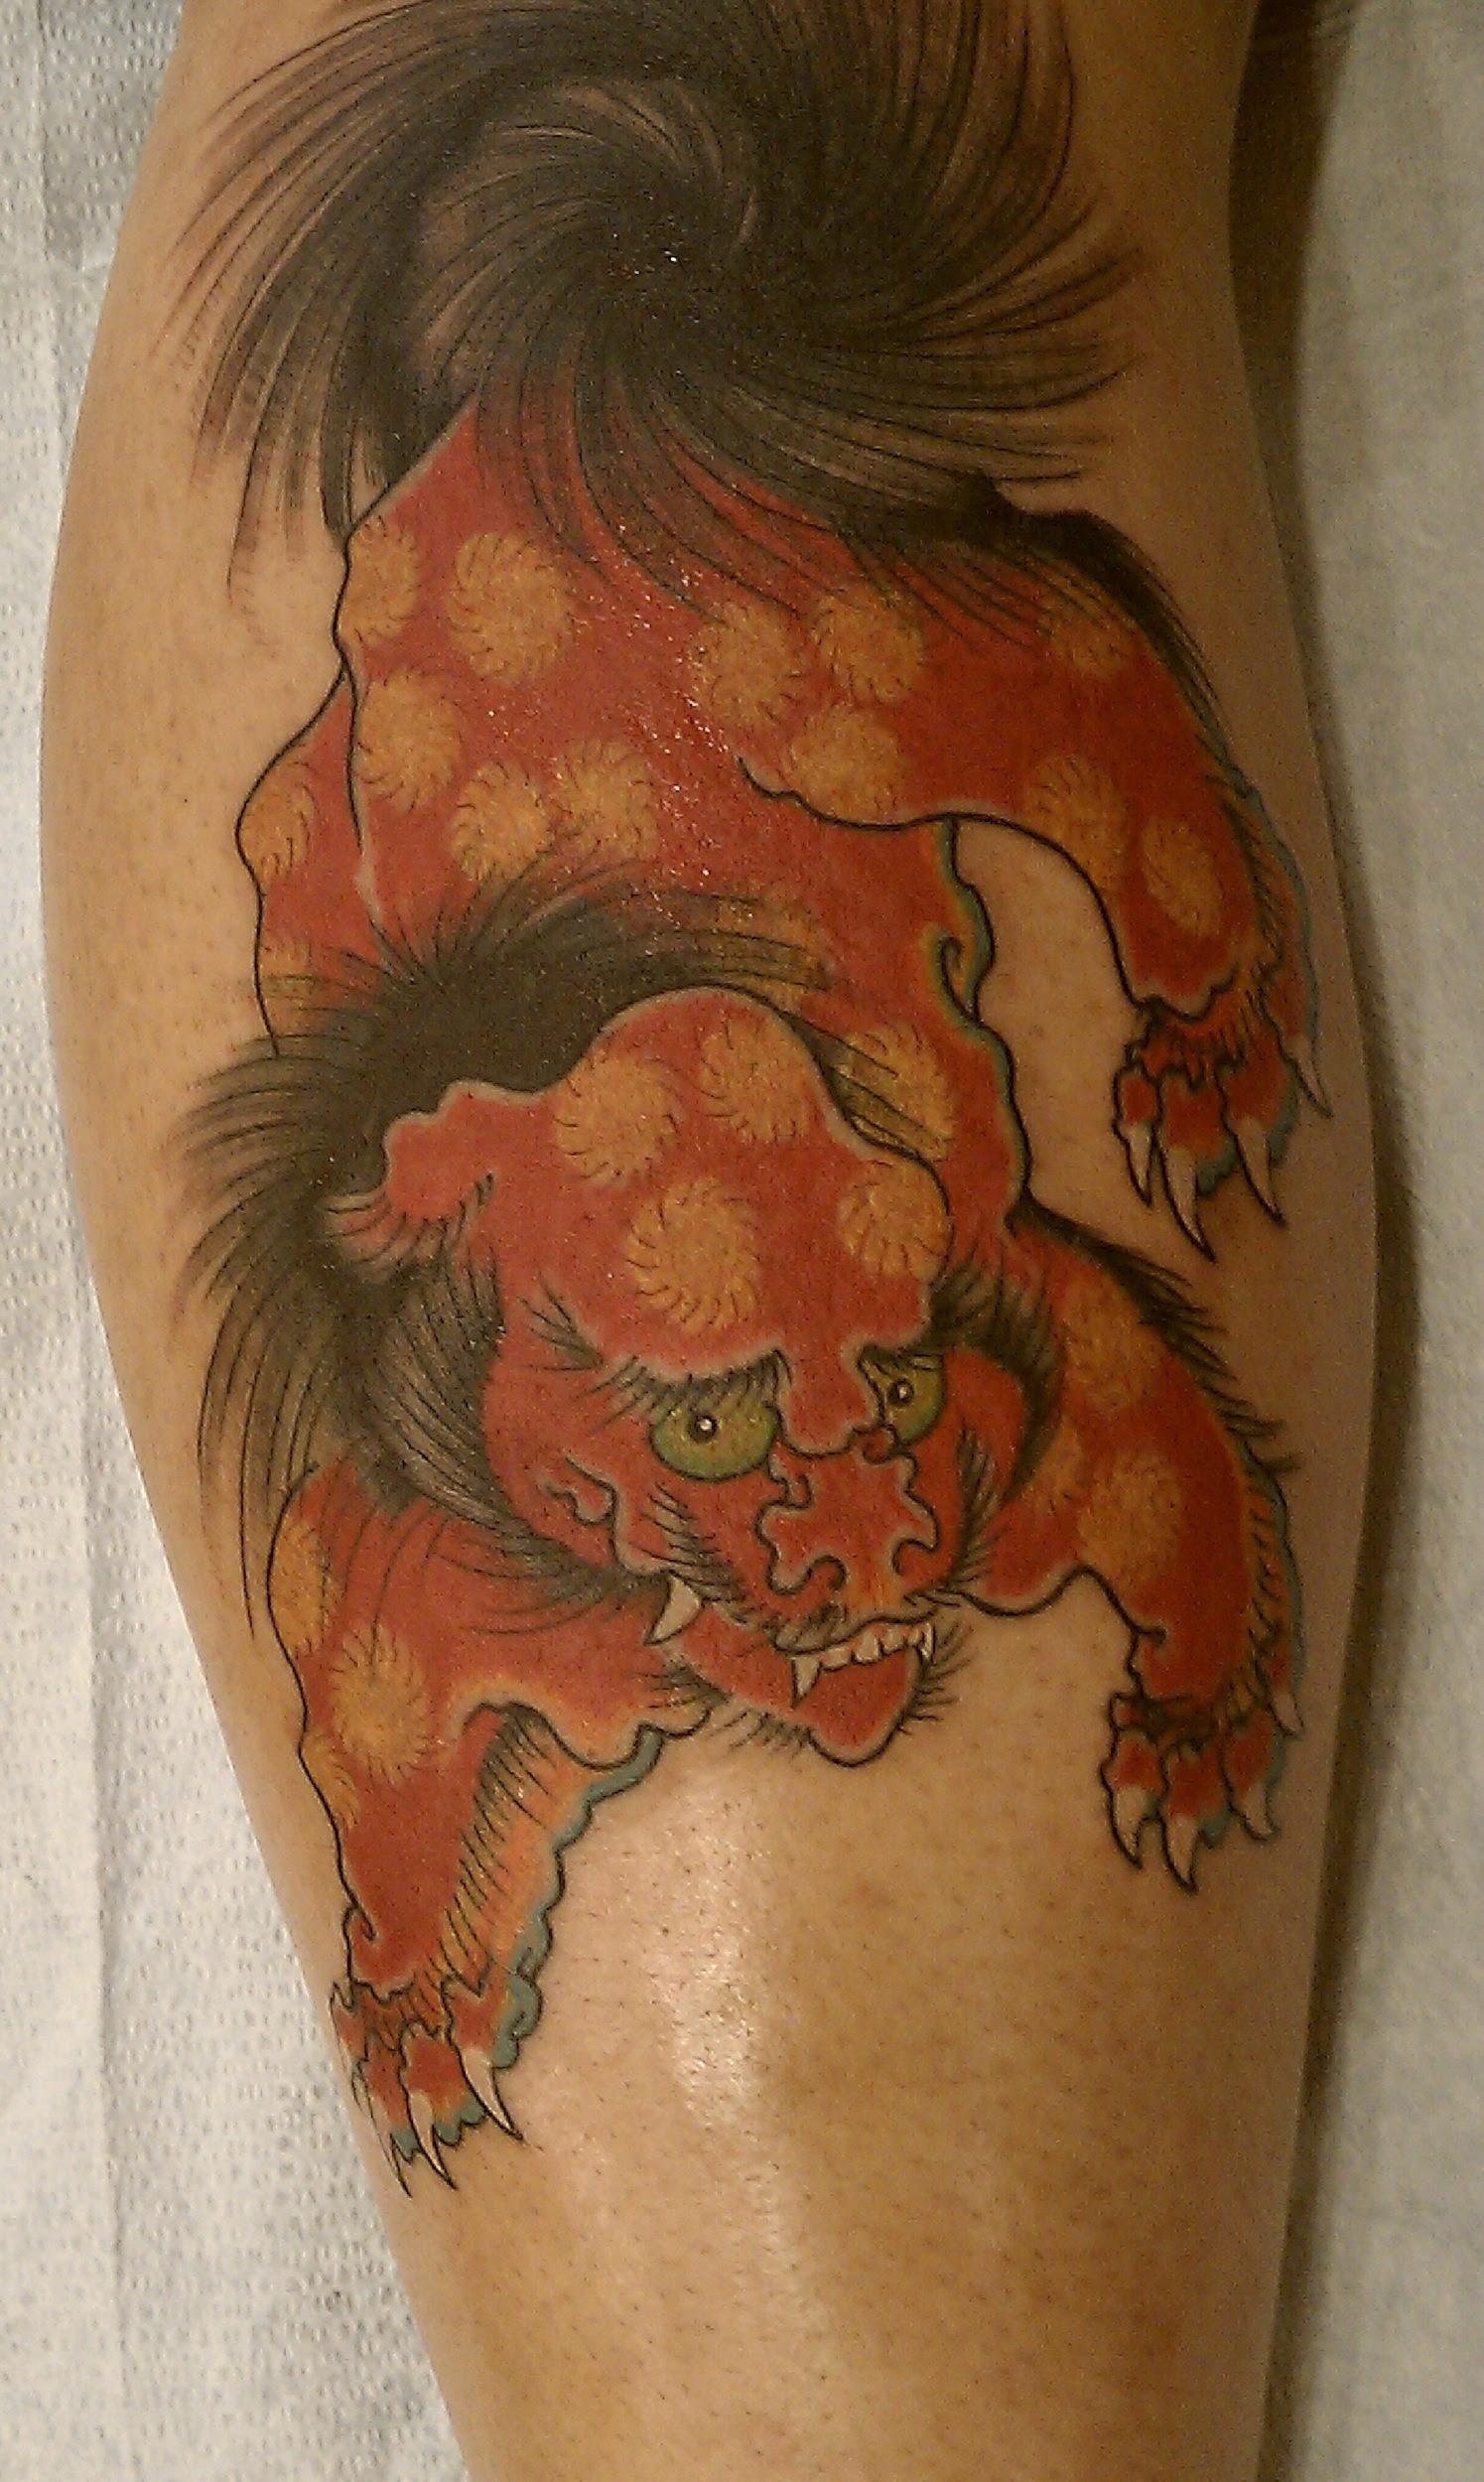 Here's a video of Daniel Herlihy filling in a Foo Dog tattoo.